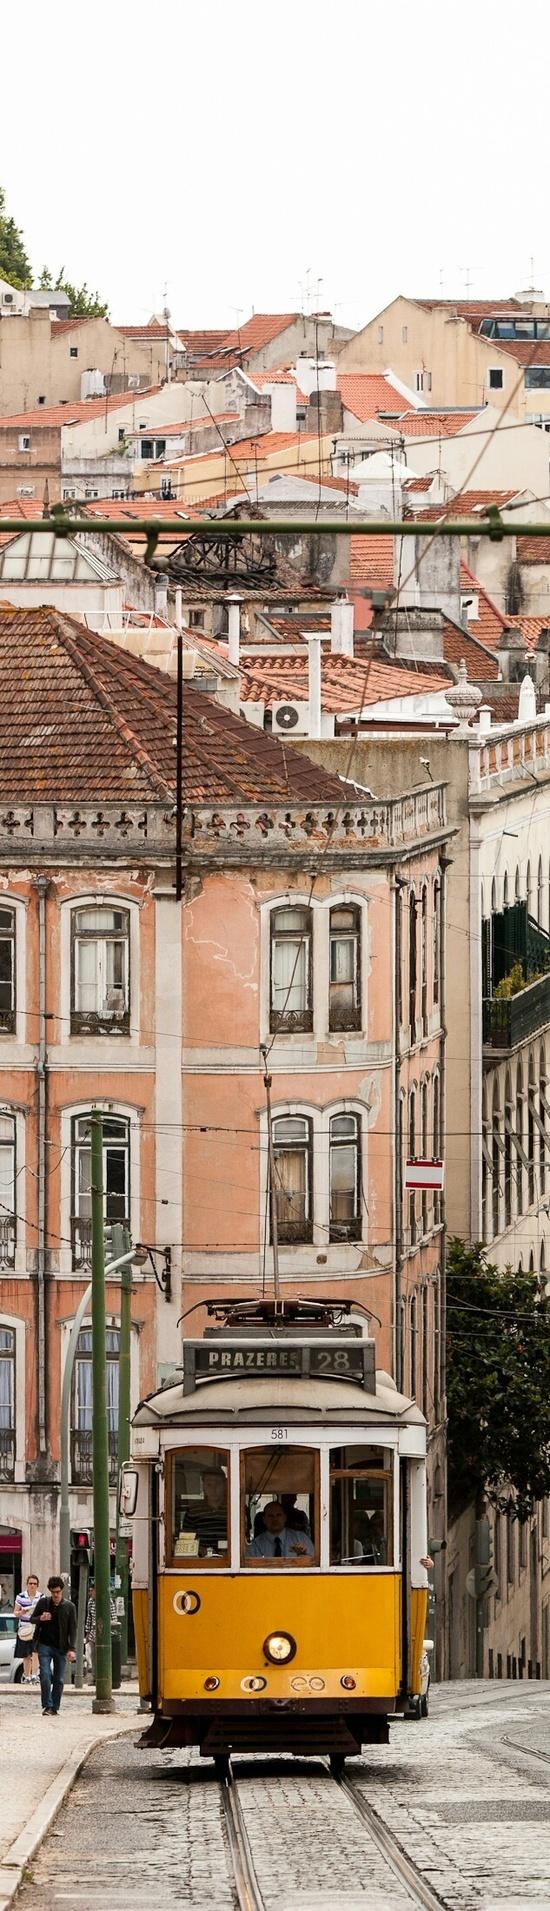 El famoso tranvía 28, Lisboa, Portugal